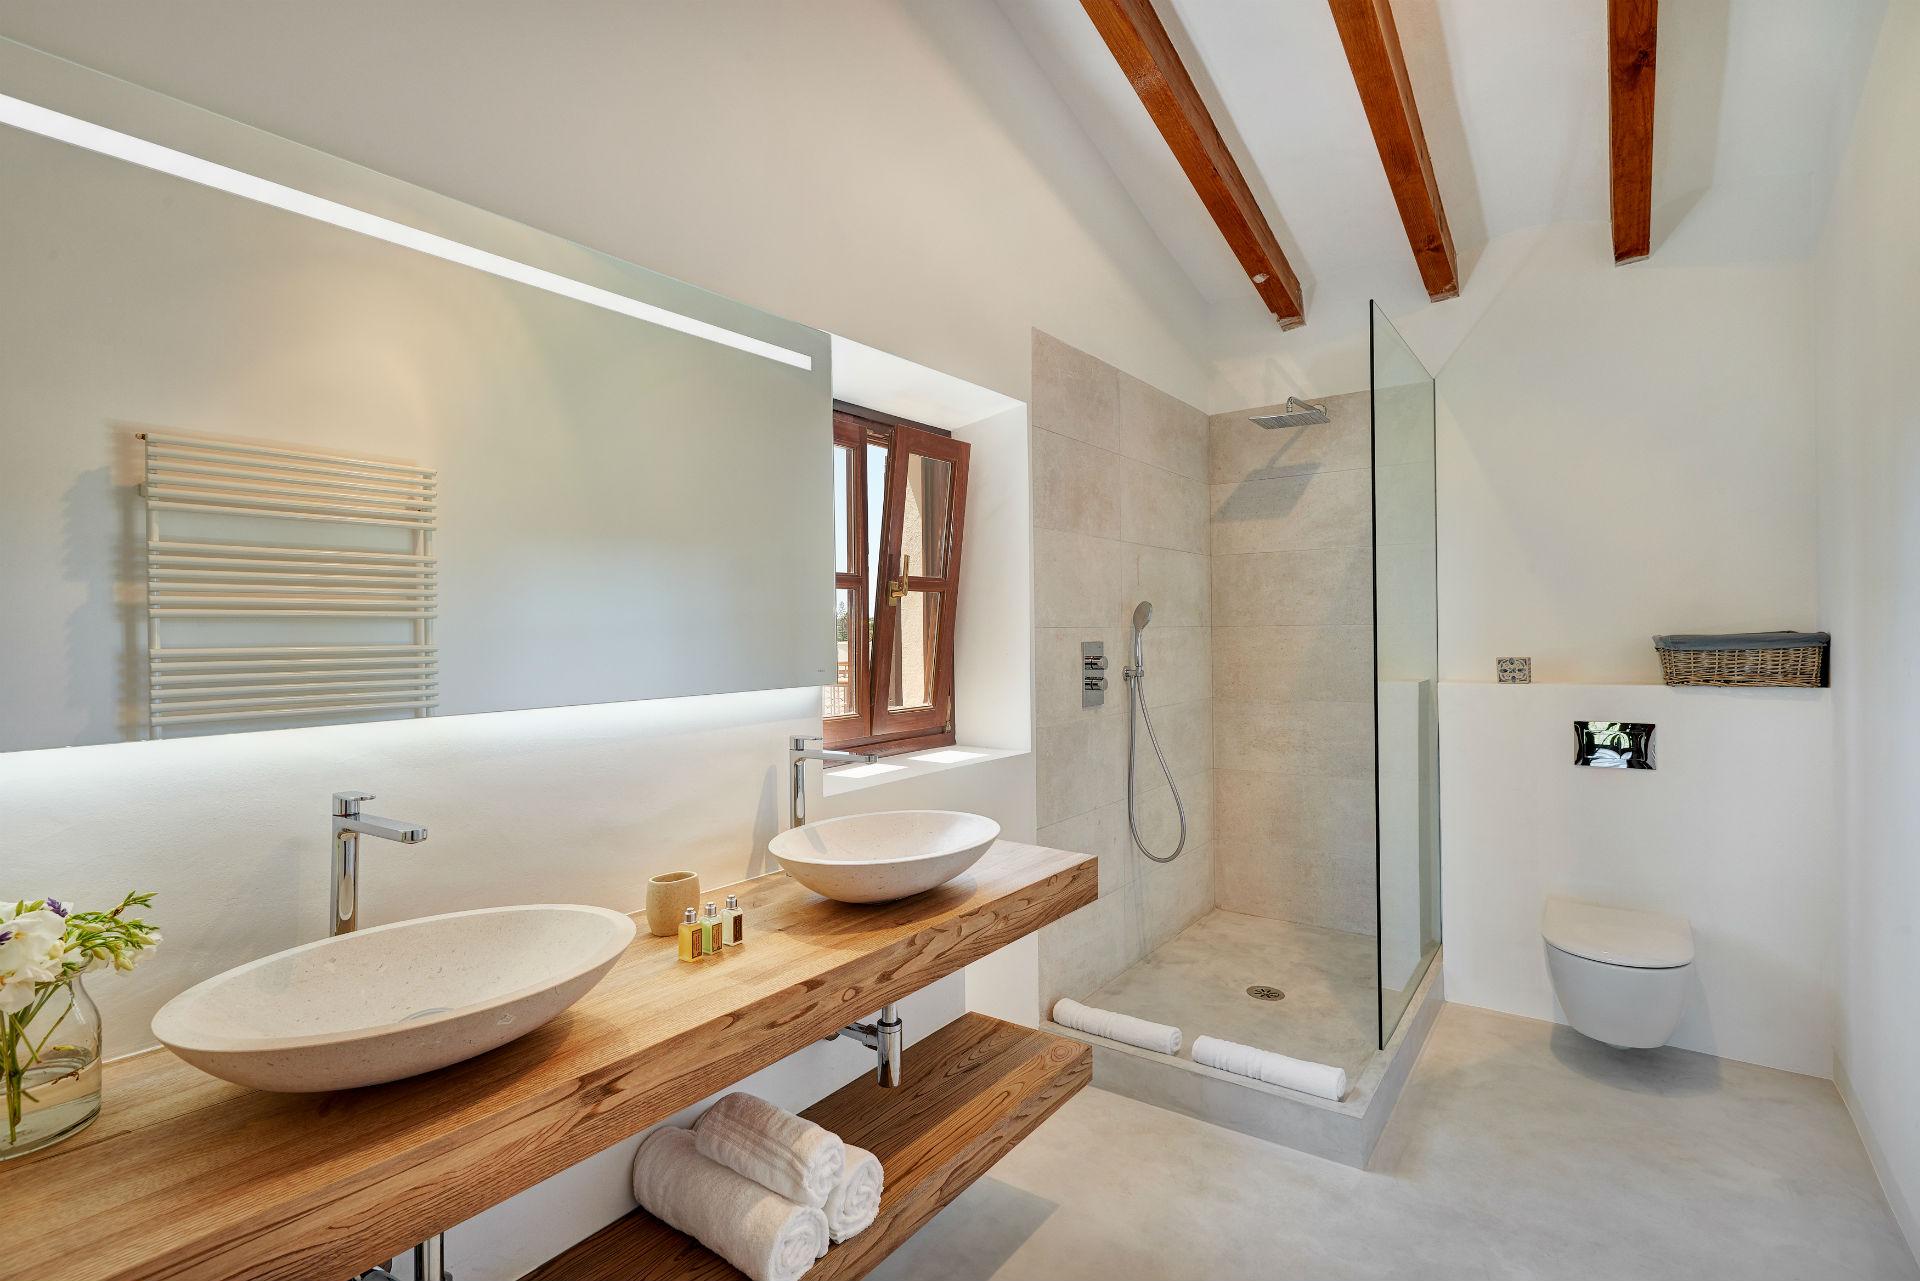 32 Casa Adrover Soller Bathroom